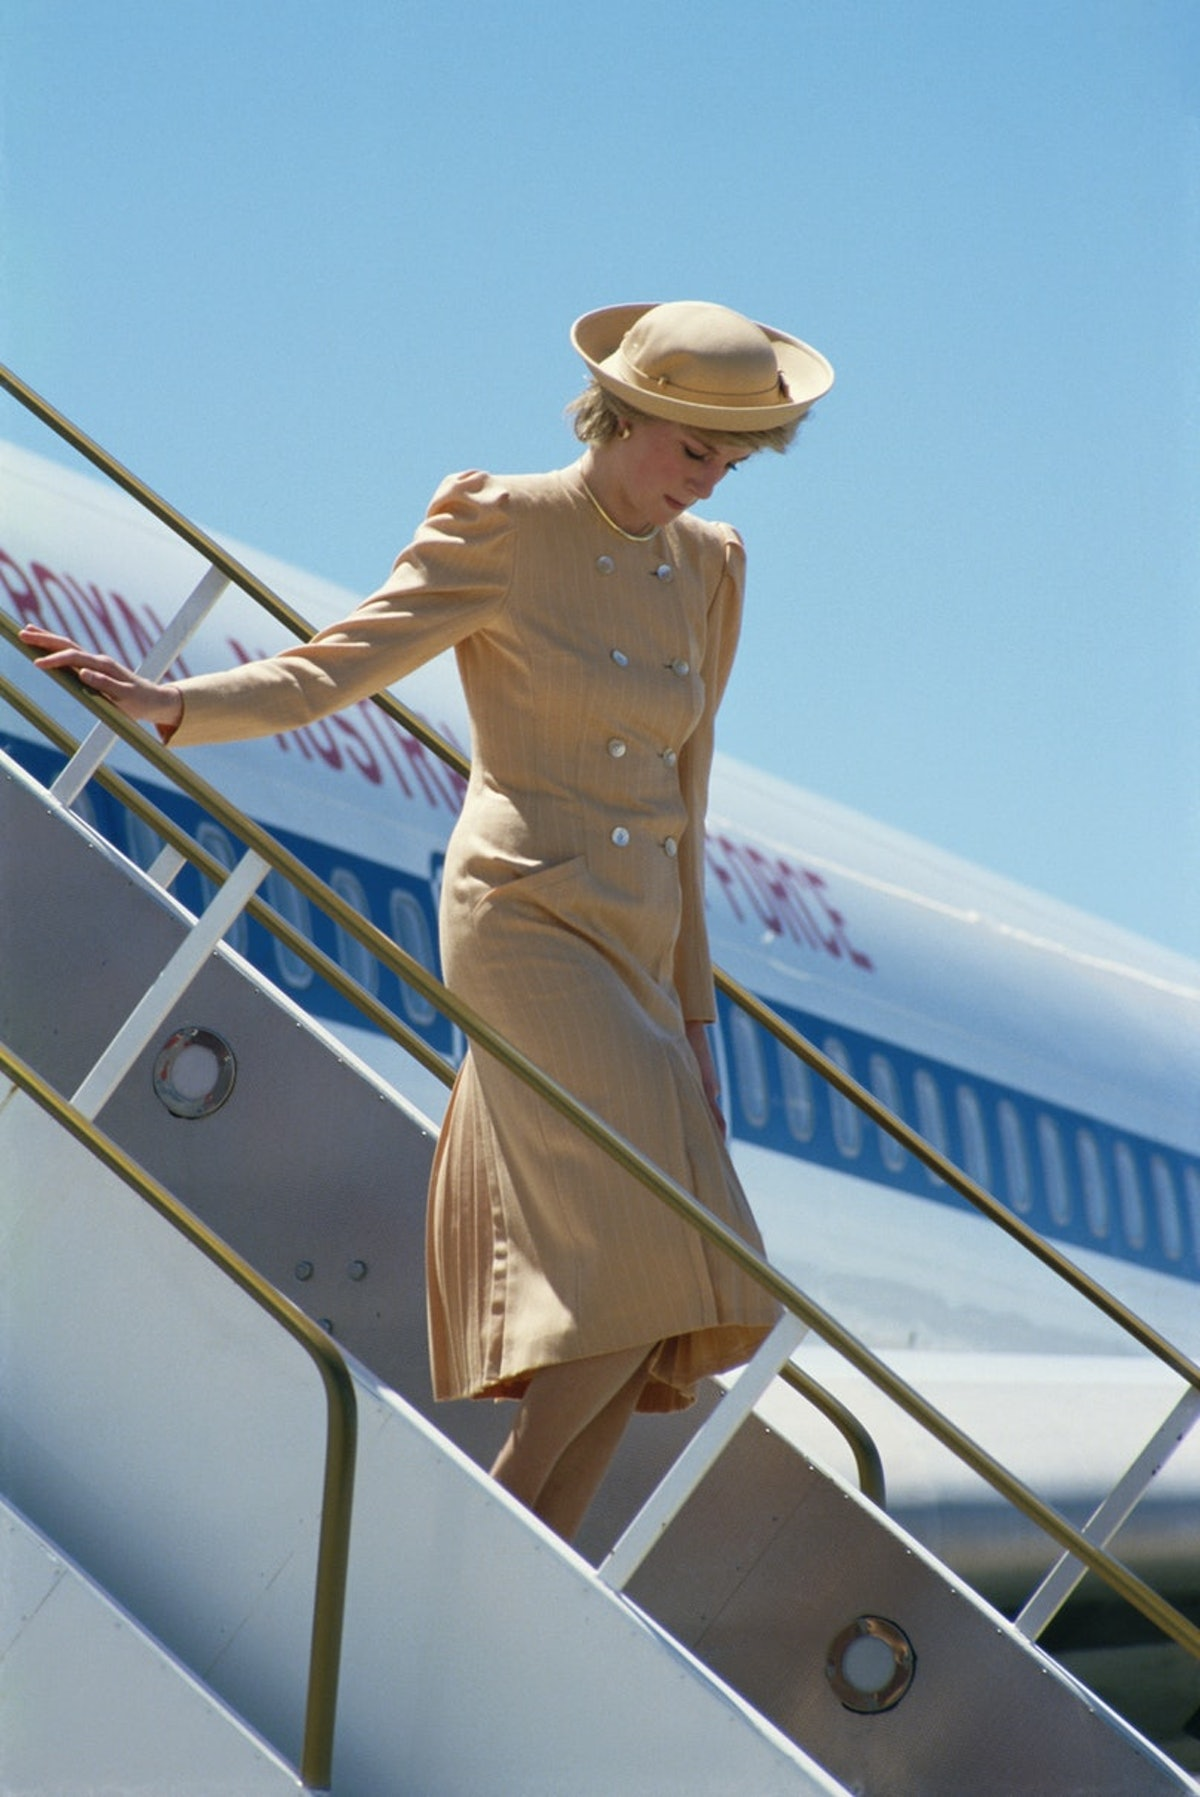 Princess Diana getting off an airplane